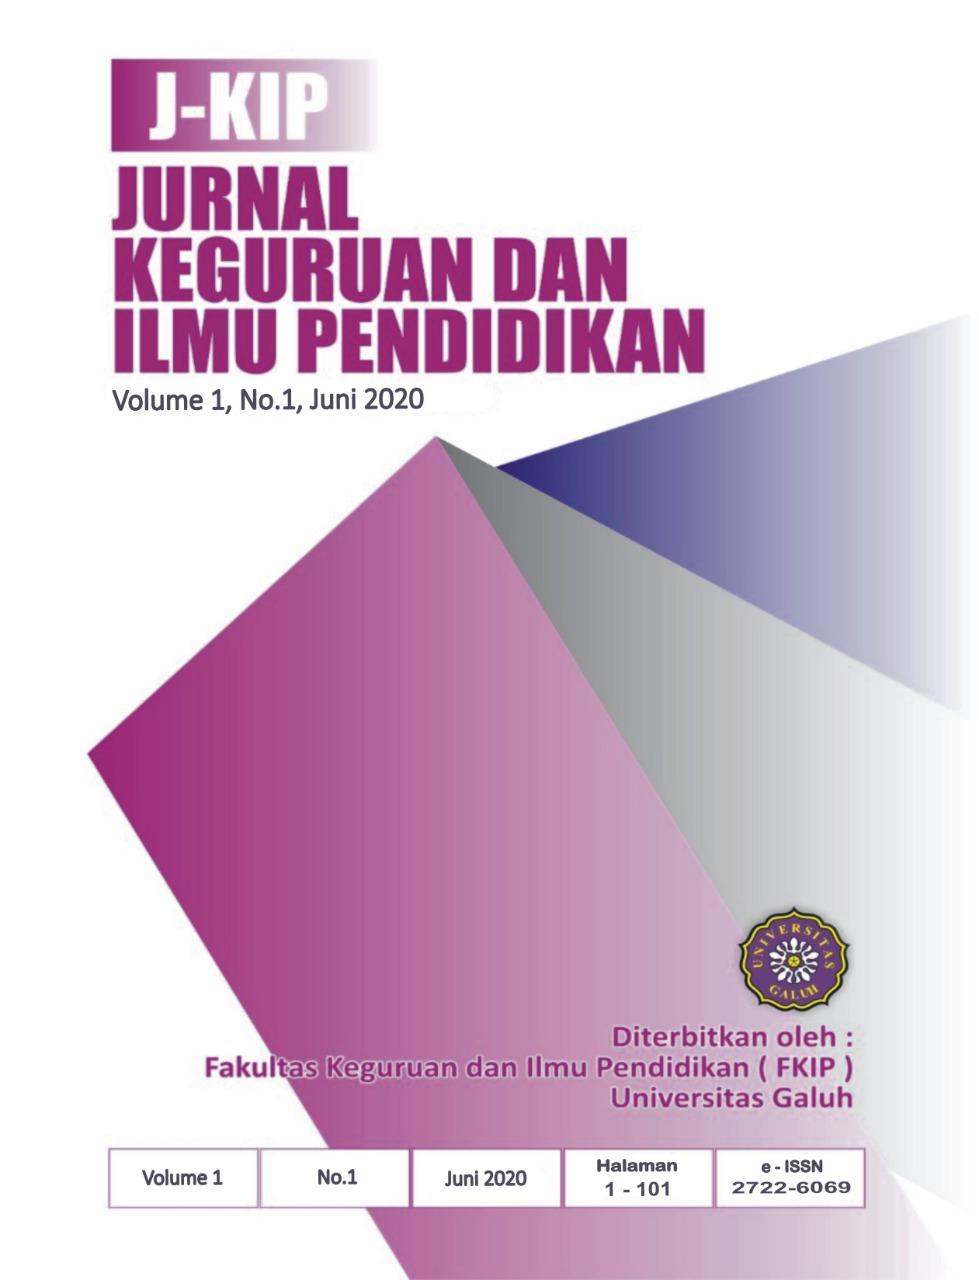 View Vol. 1 No. 1 (2020): J-KIP (Jurnal Keguruan dan Ilmu Pendidikan)